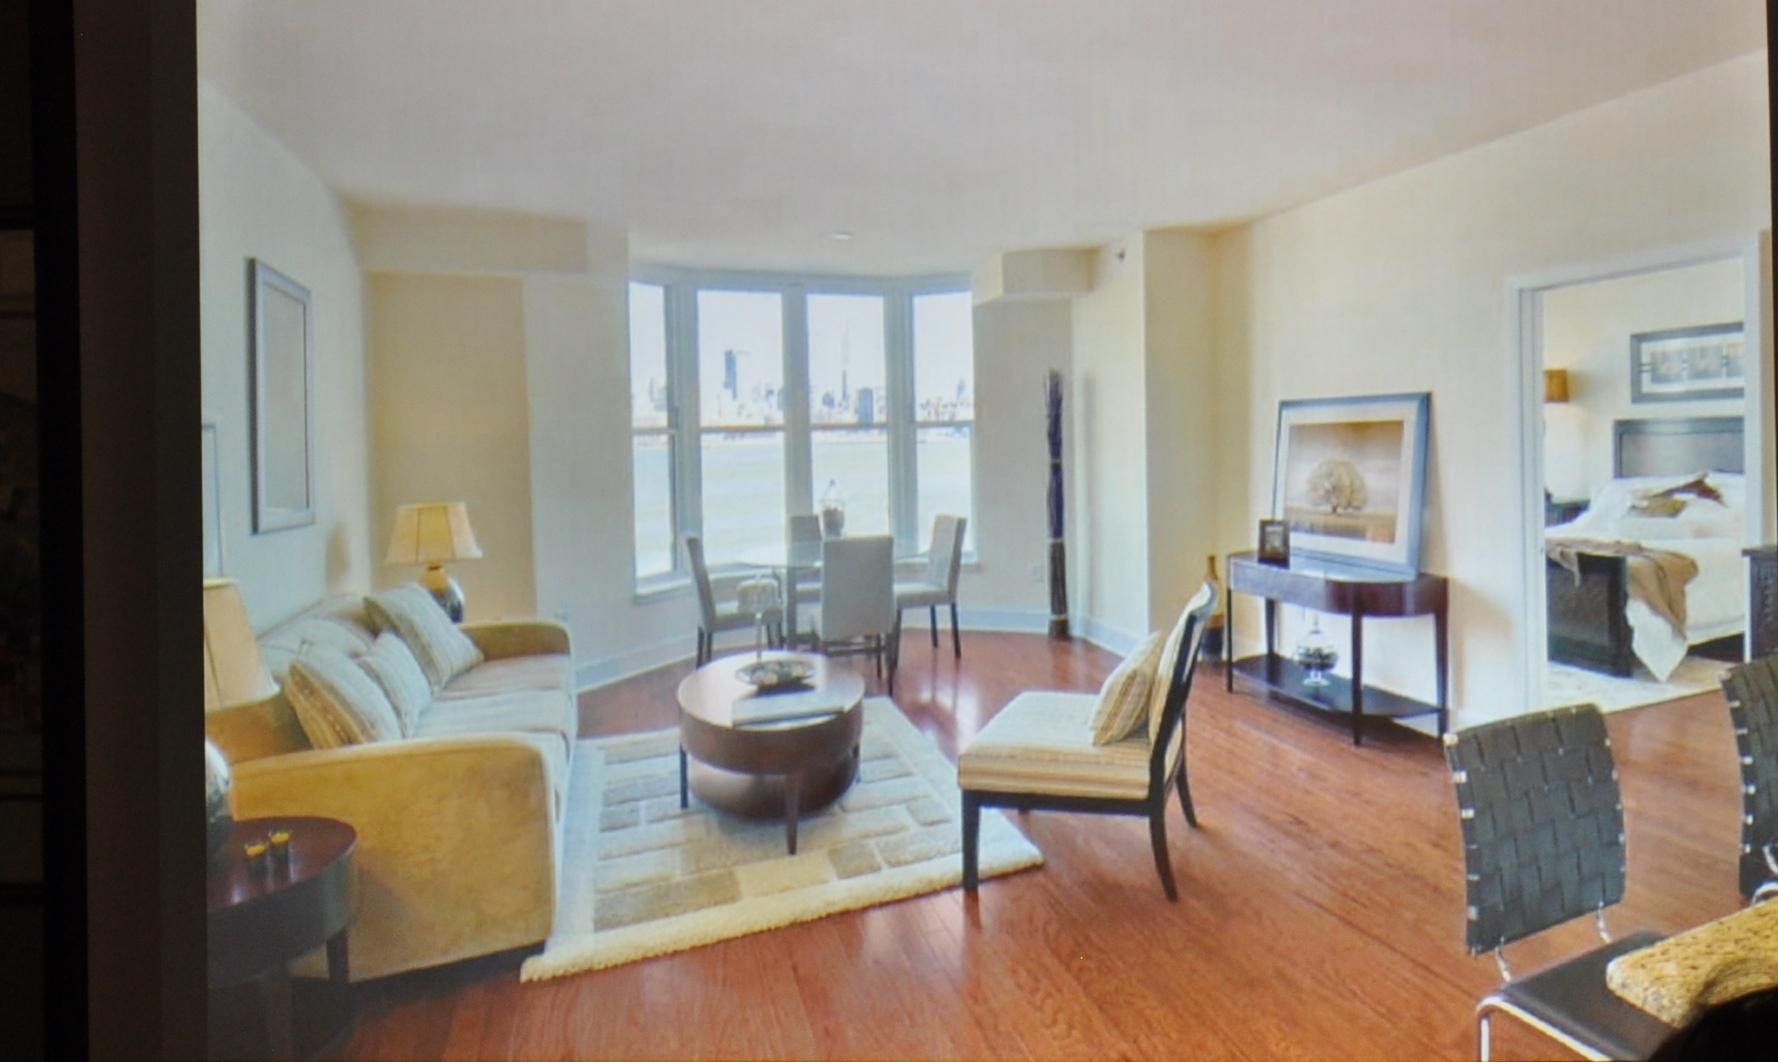 18b33e6419b920c53825_apartments1.JPG